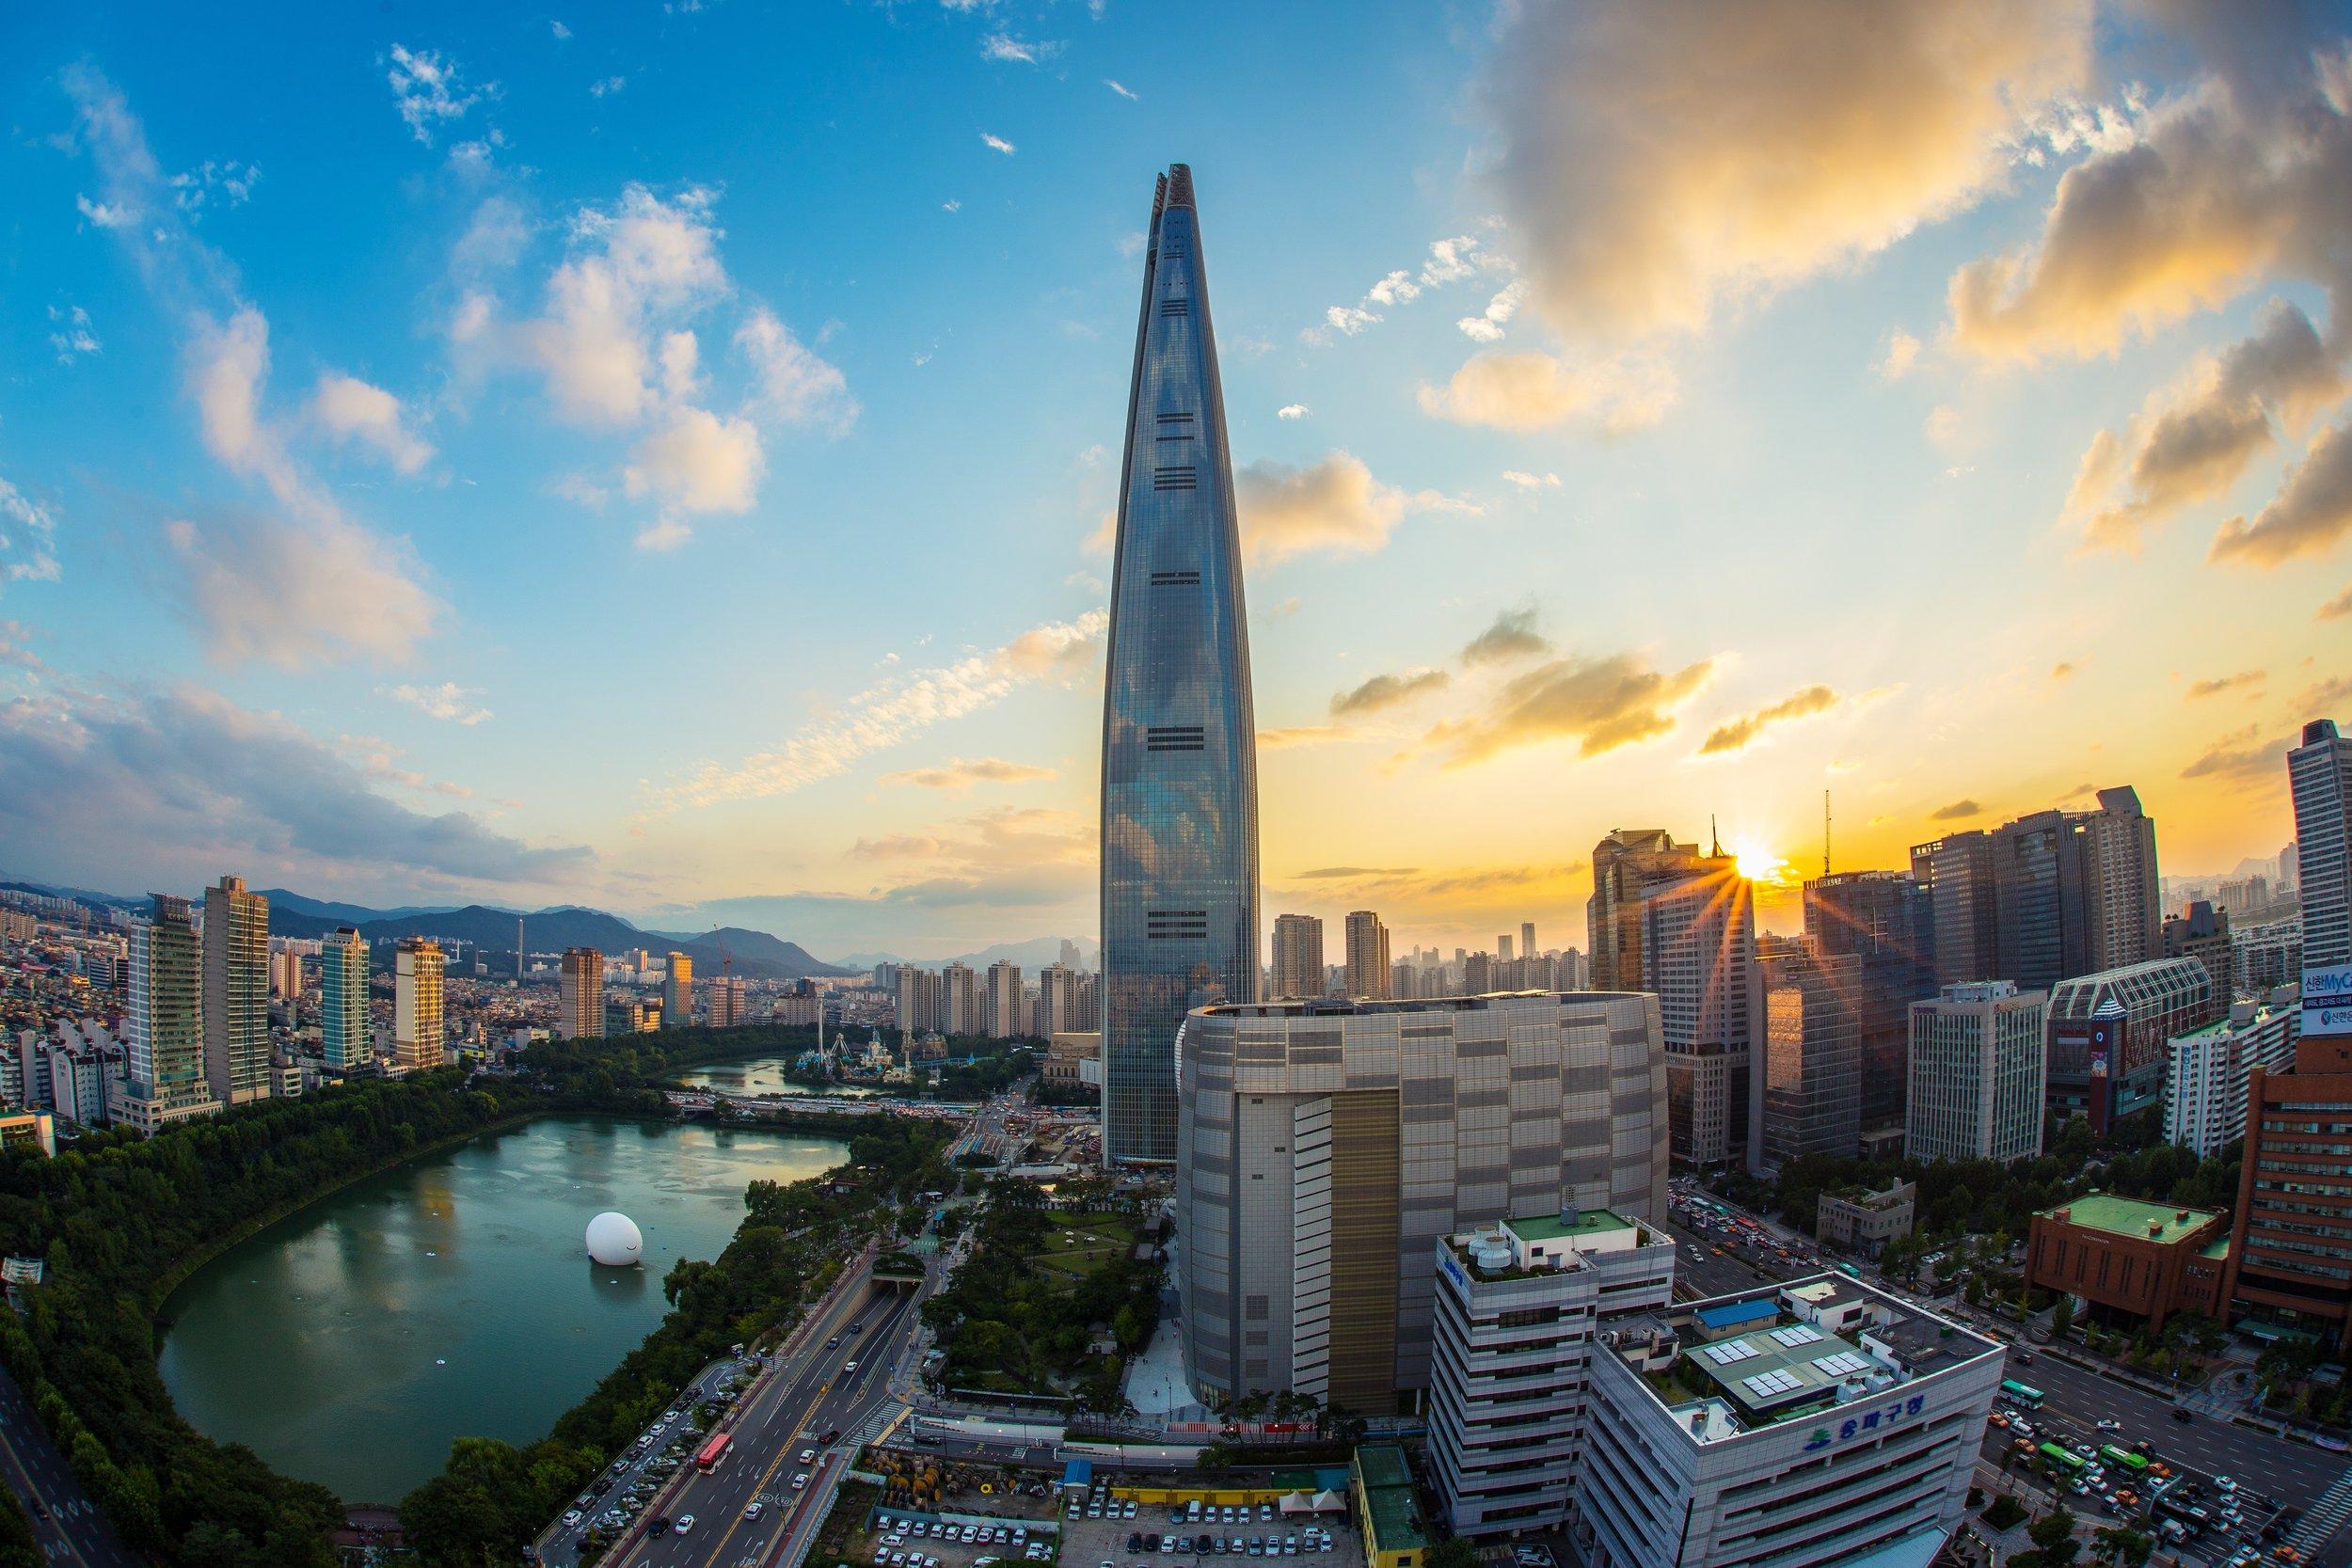 architecture-buildings-city-237211.jpg